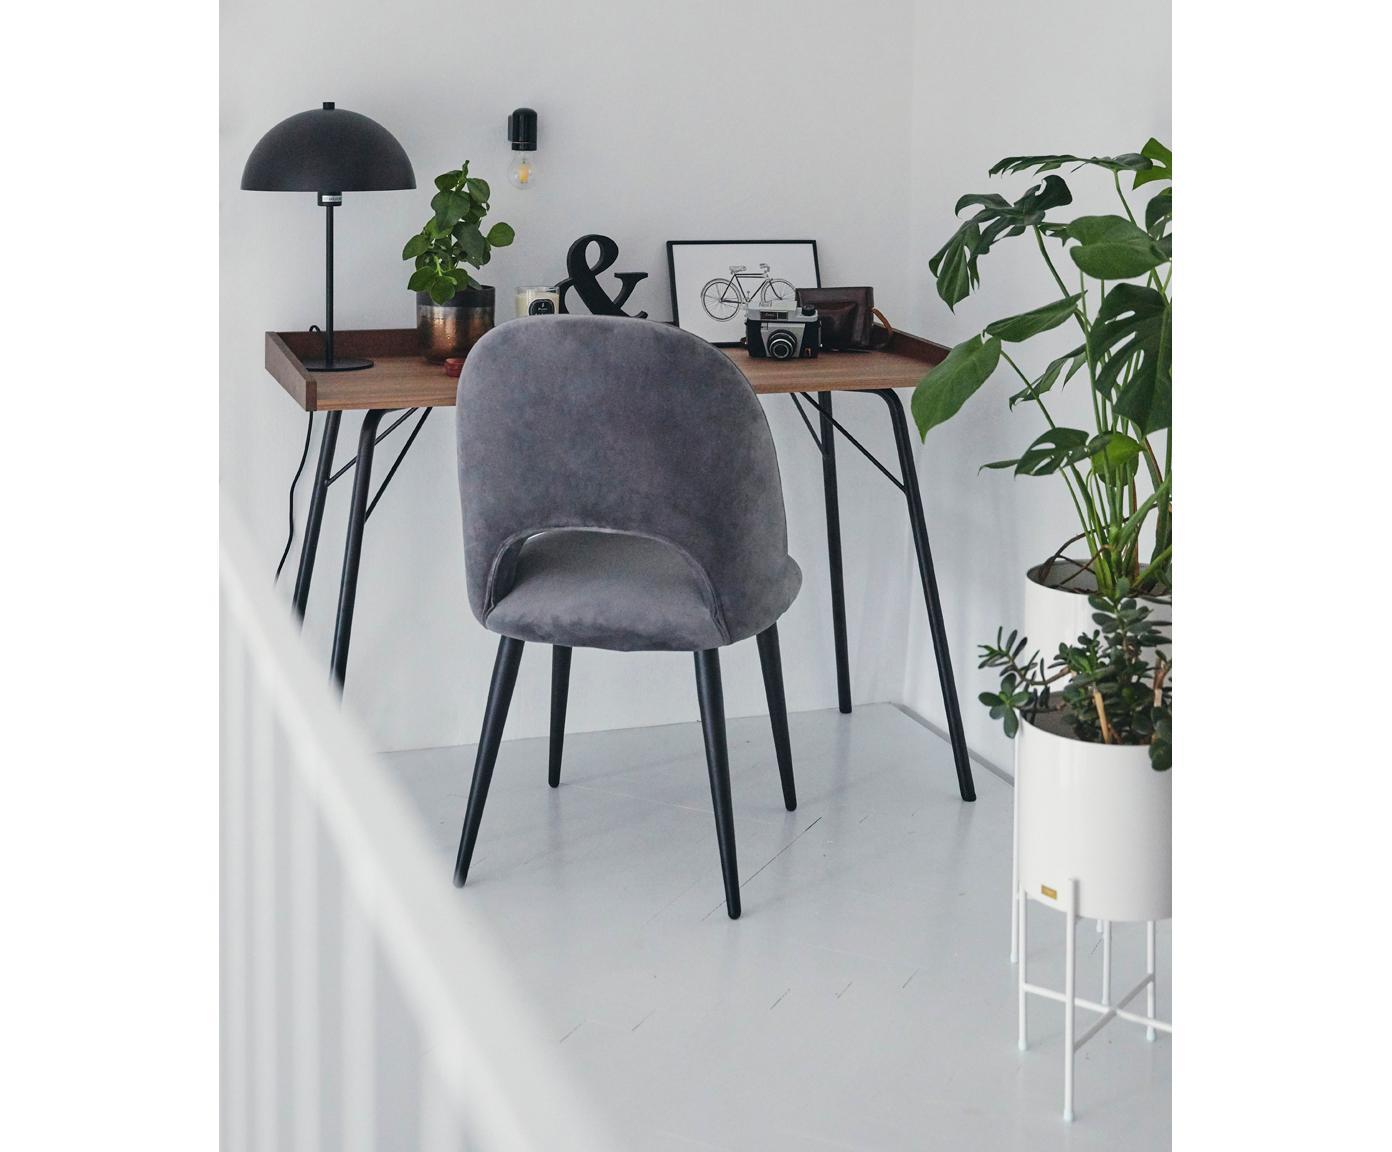 Sedia imbottita in velluto Rachel, Rivestimento: velluto (copertura in pol, Gambe: metallo verniciato a polv, Grigio, Larg. 53 x Prof. 57 cm